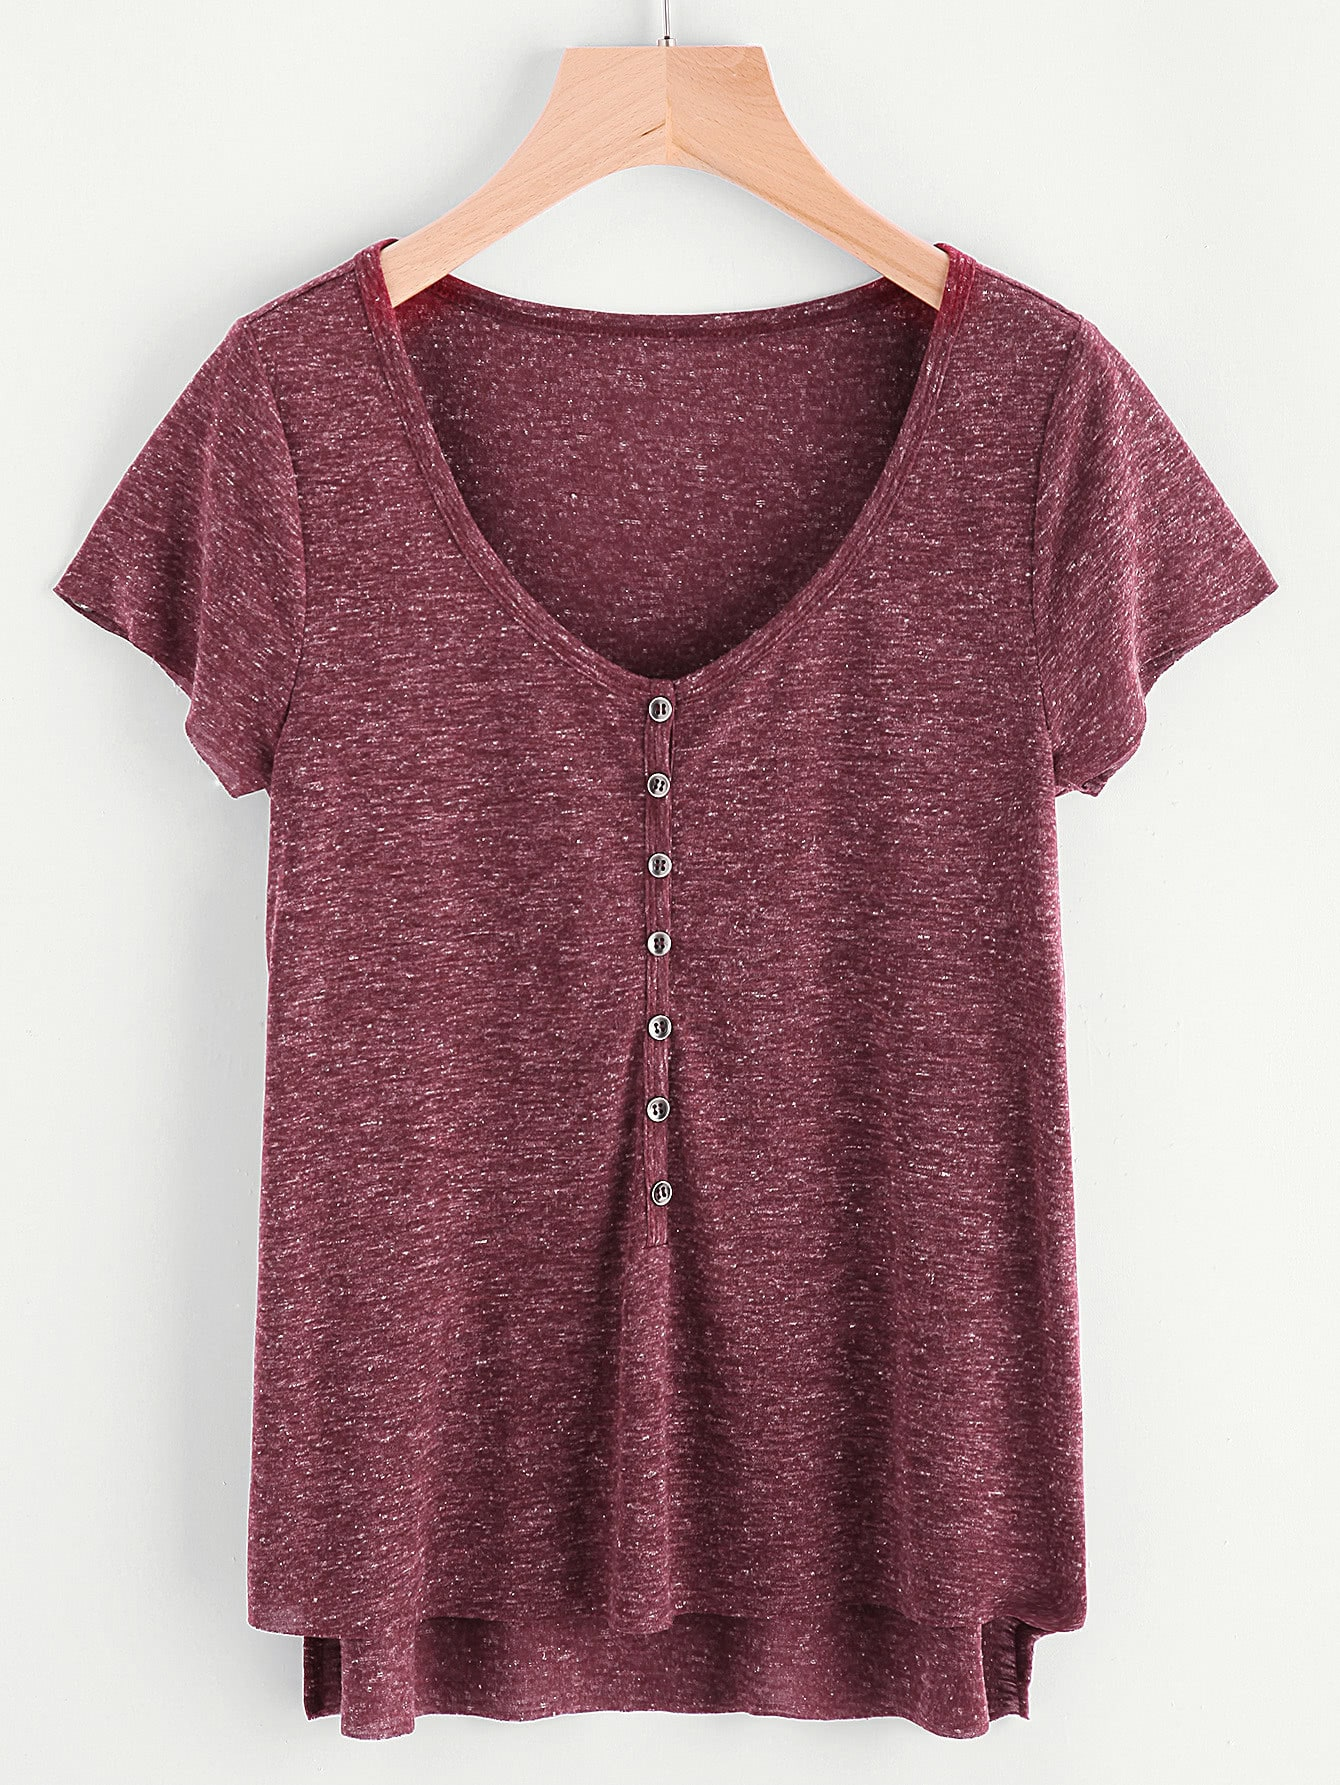 Фото Marled Knit Button Front Staggered Hem T-shirt. Купить с доставкой